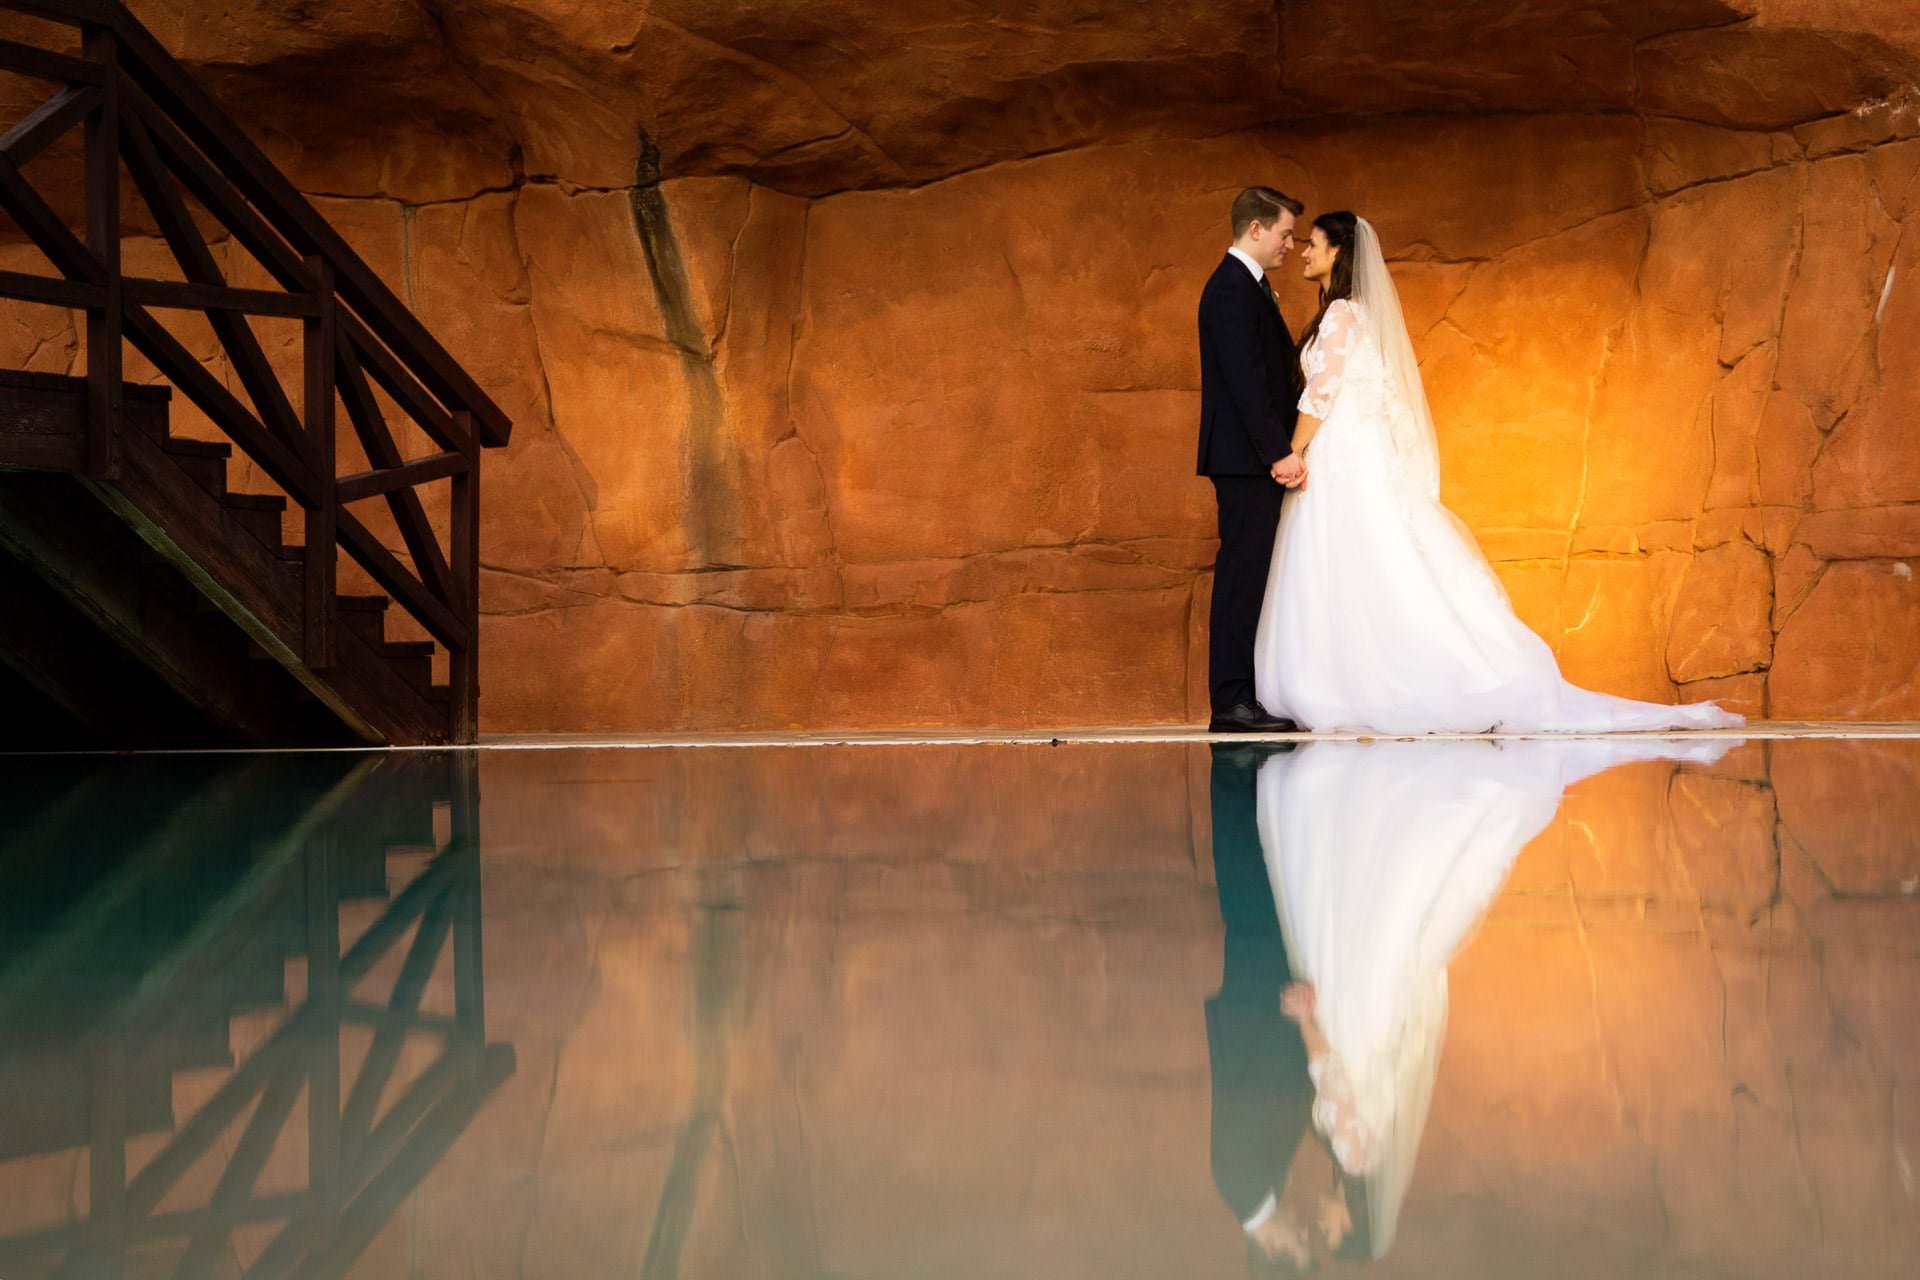 award winning wedding photographer bristol 01 2